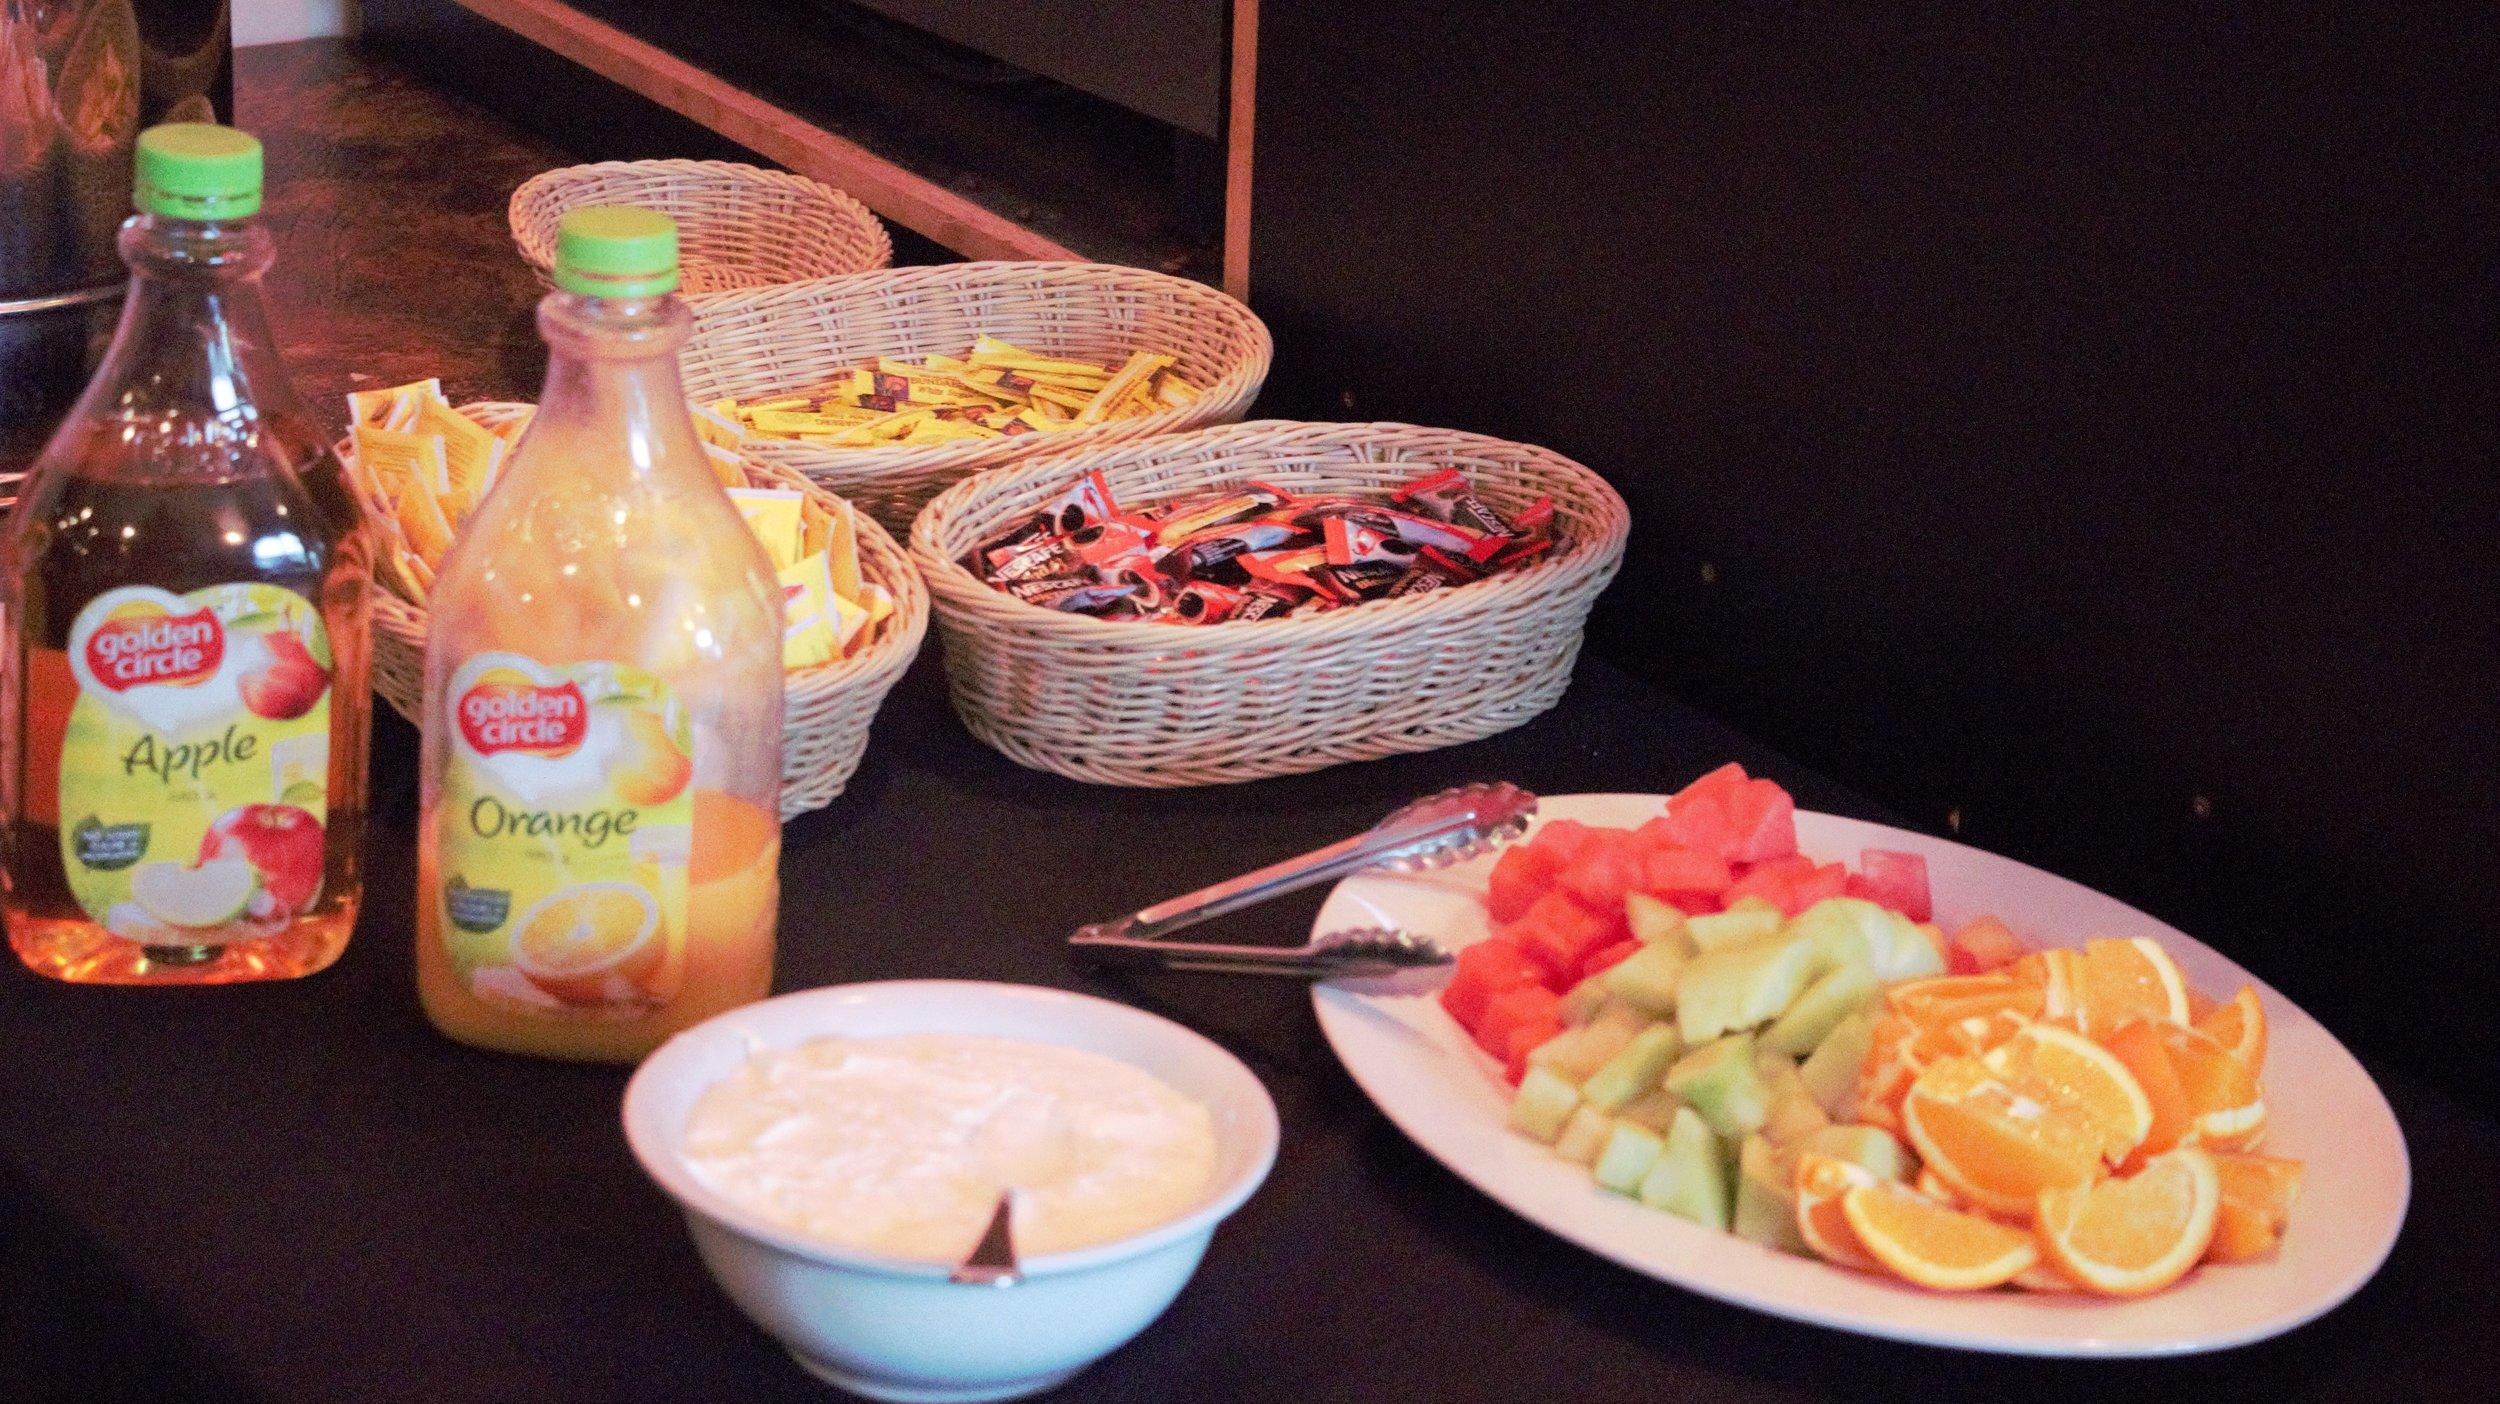 continental breakfast at alpine retreat yogurt and fruit.jpg